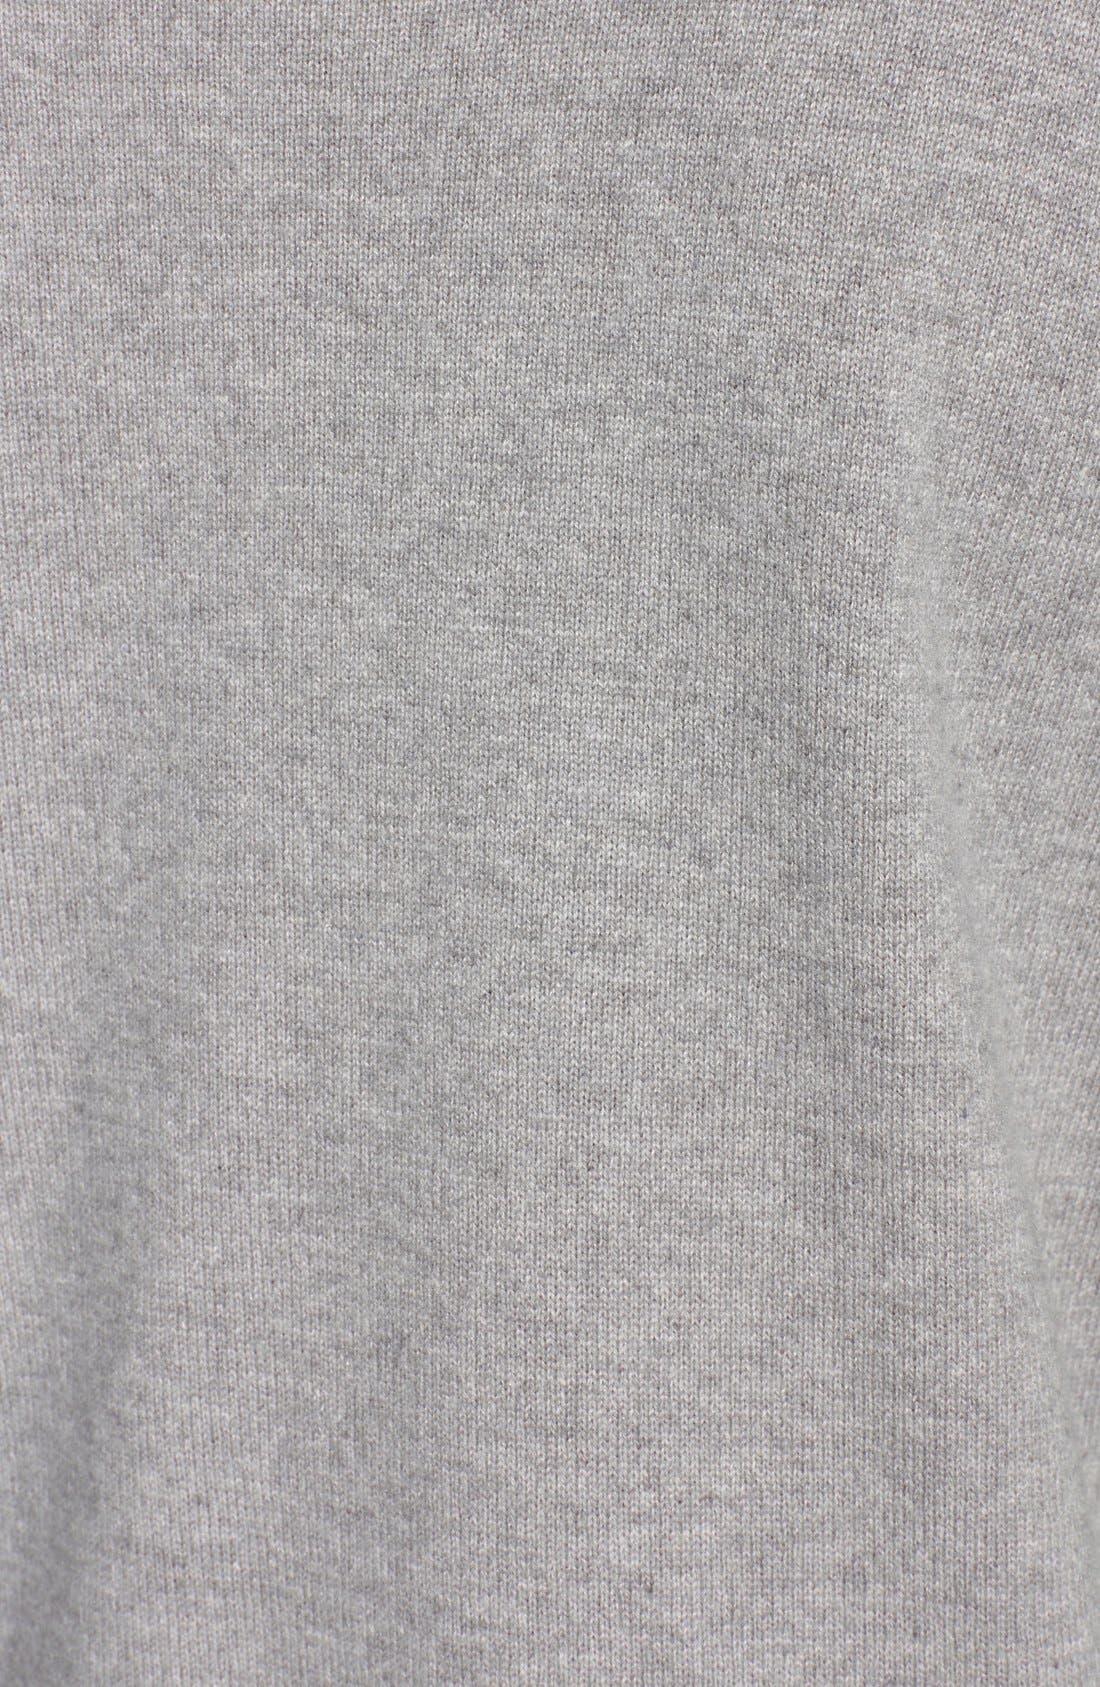 Alternate Image 3  - Fabiana Filippi Suede Contrast Wool Blend Turtleneck Sweater